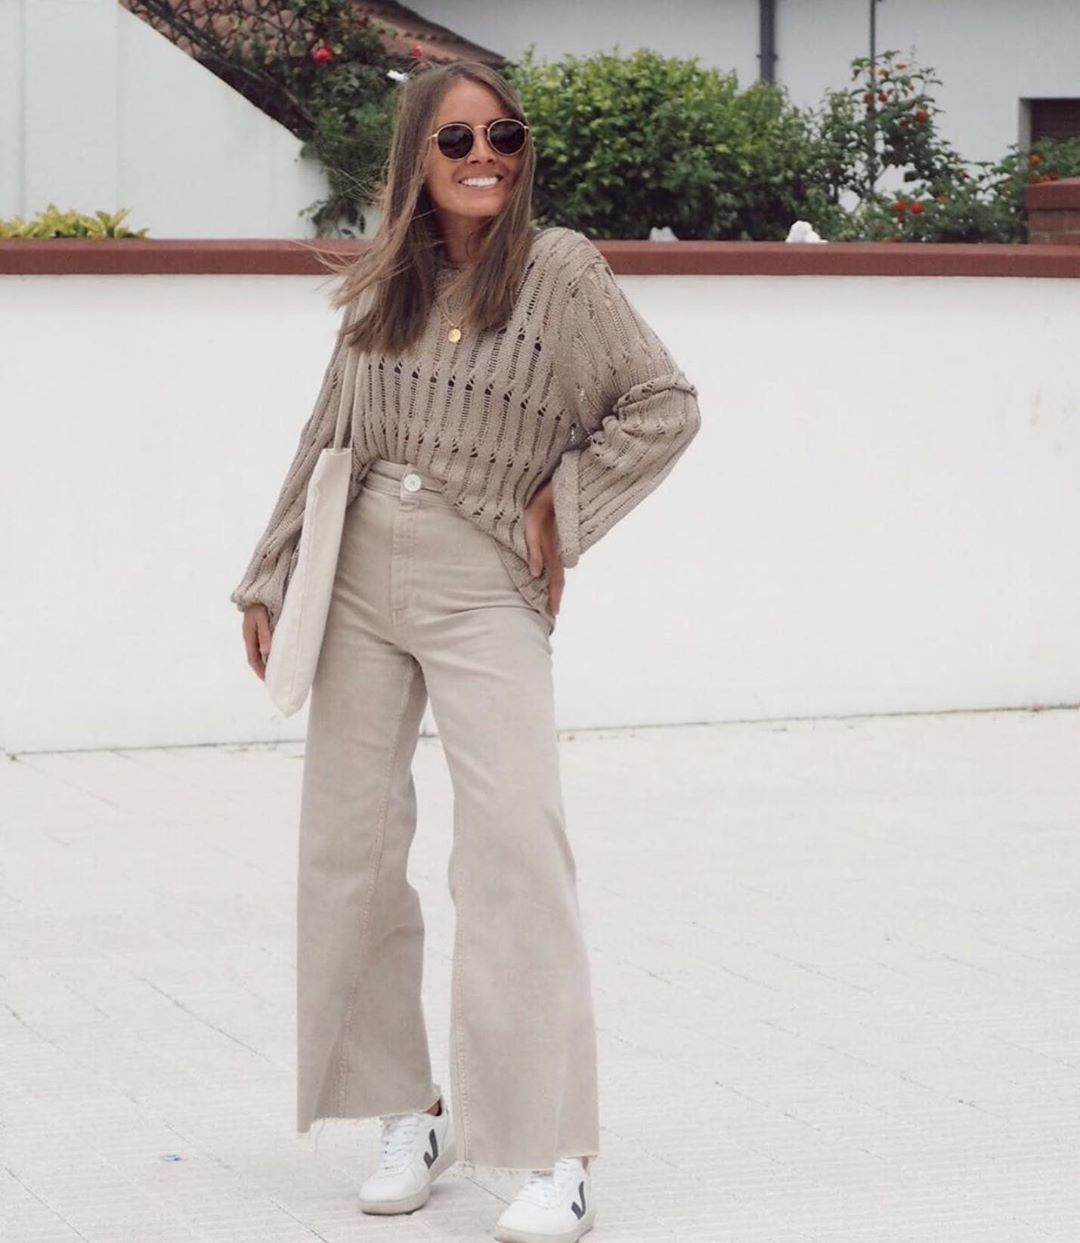 bermuda shorts zw premium navy straight de Zara sur zaraaddiction